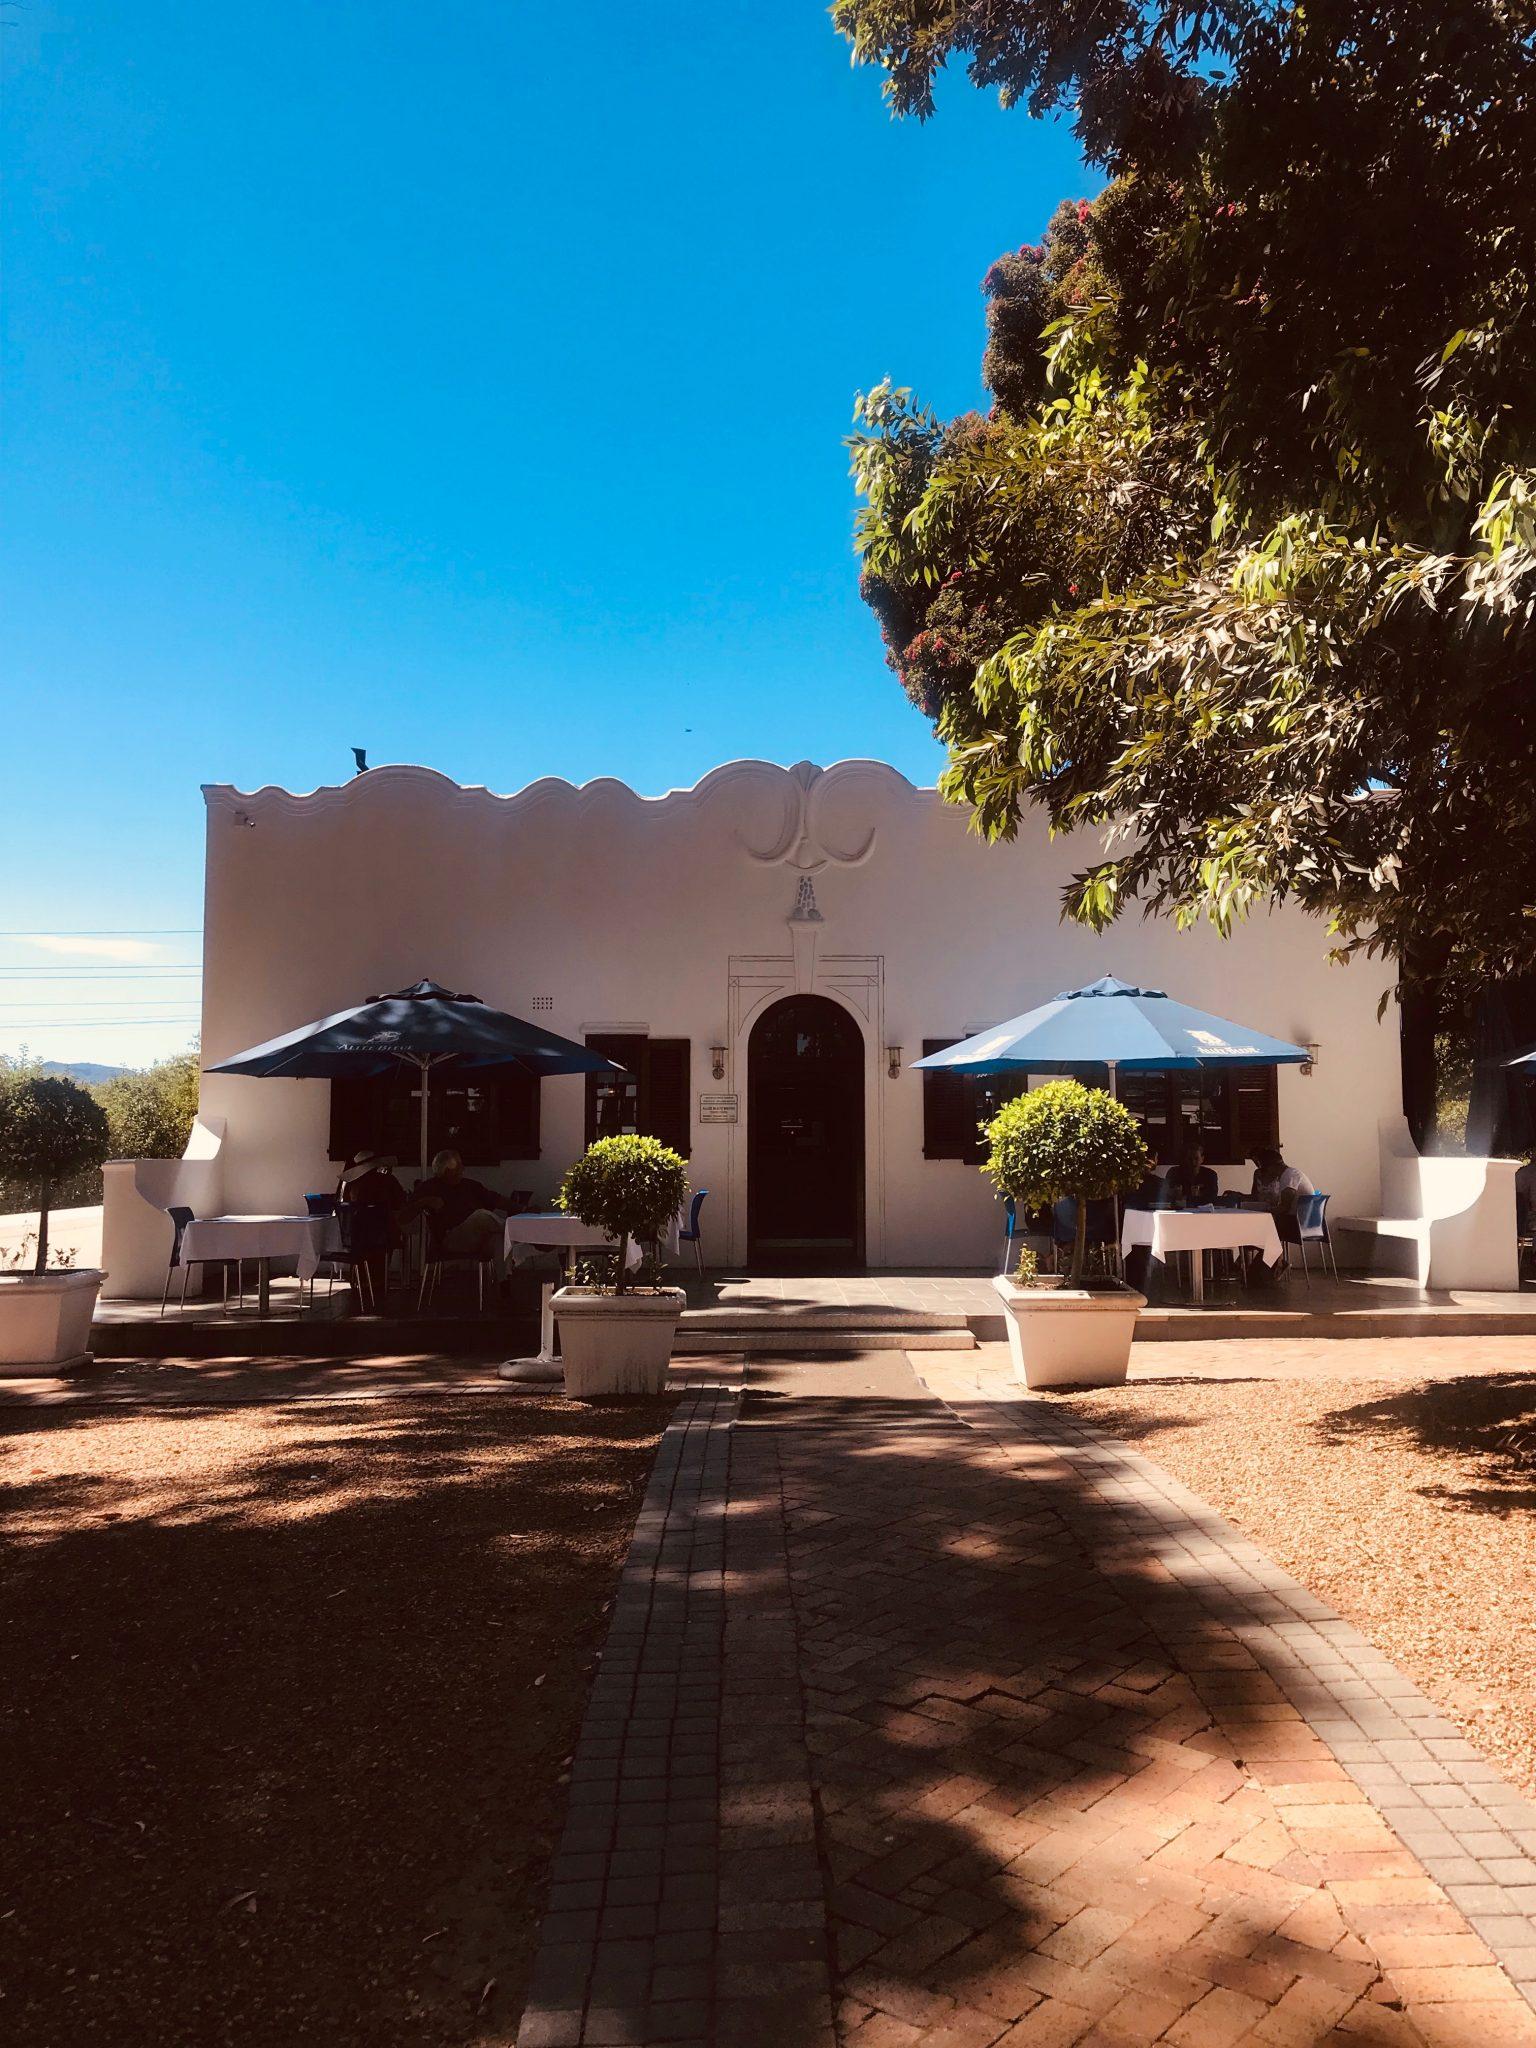 The Franschhoek Wine Tram 10